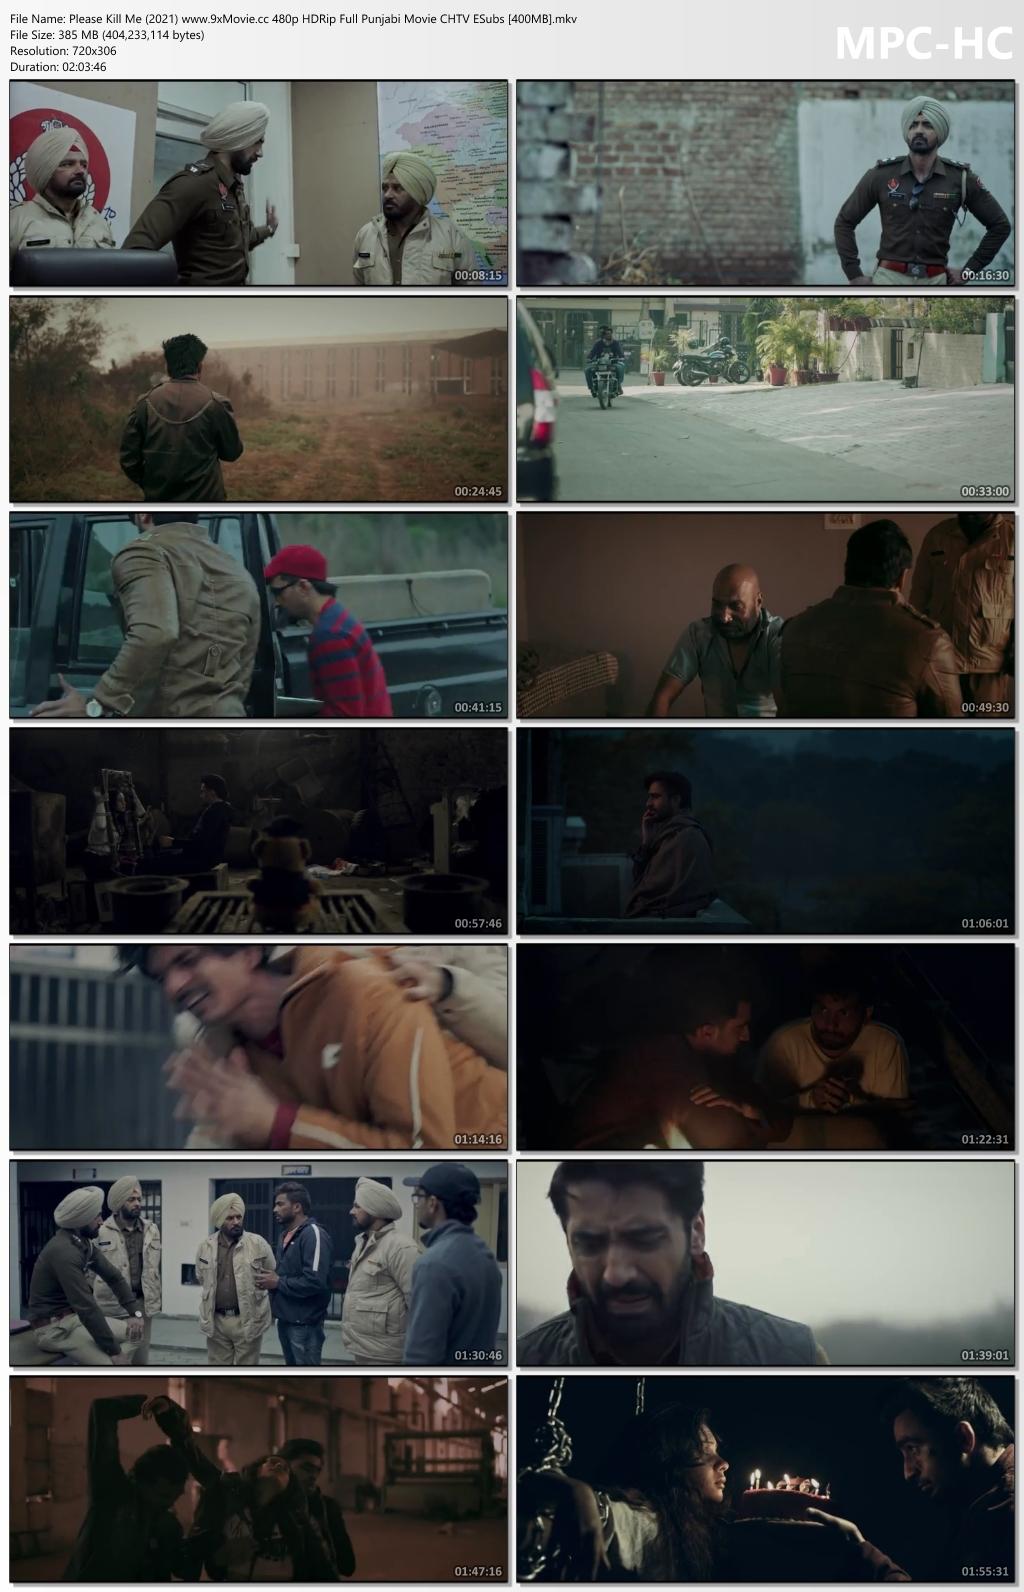 Please-Kill-Me-2021-www-9x-Movie-cc-480p-HDRip-Full-Punjabi-Movie-CHTV-ESubs-400-MB-mkv